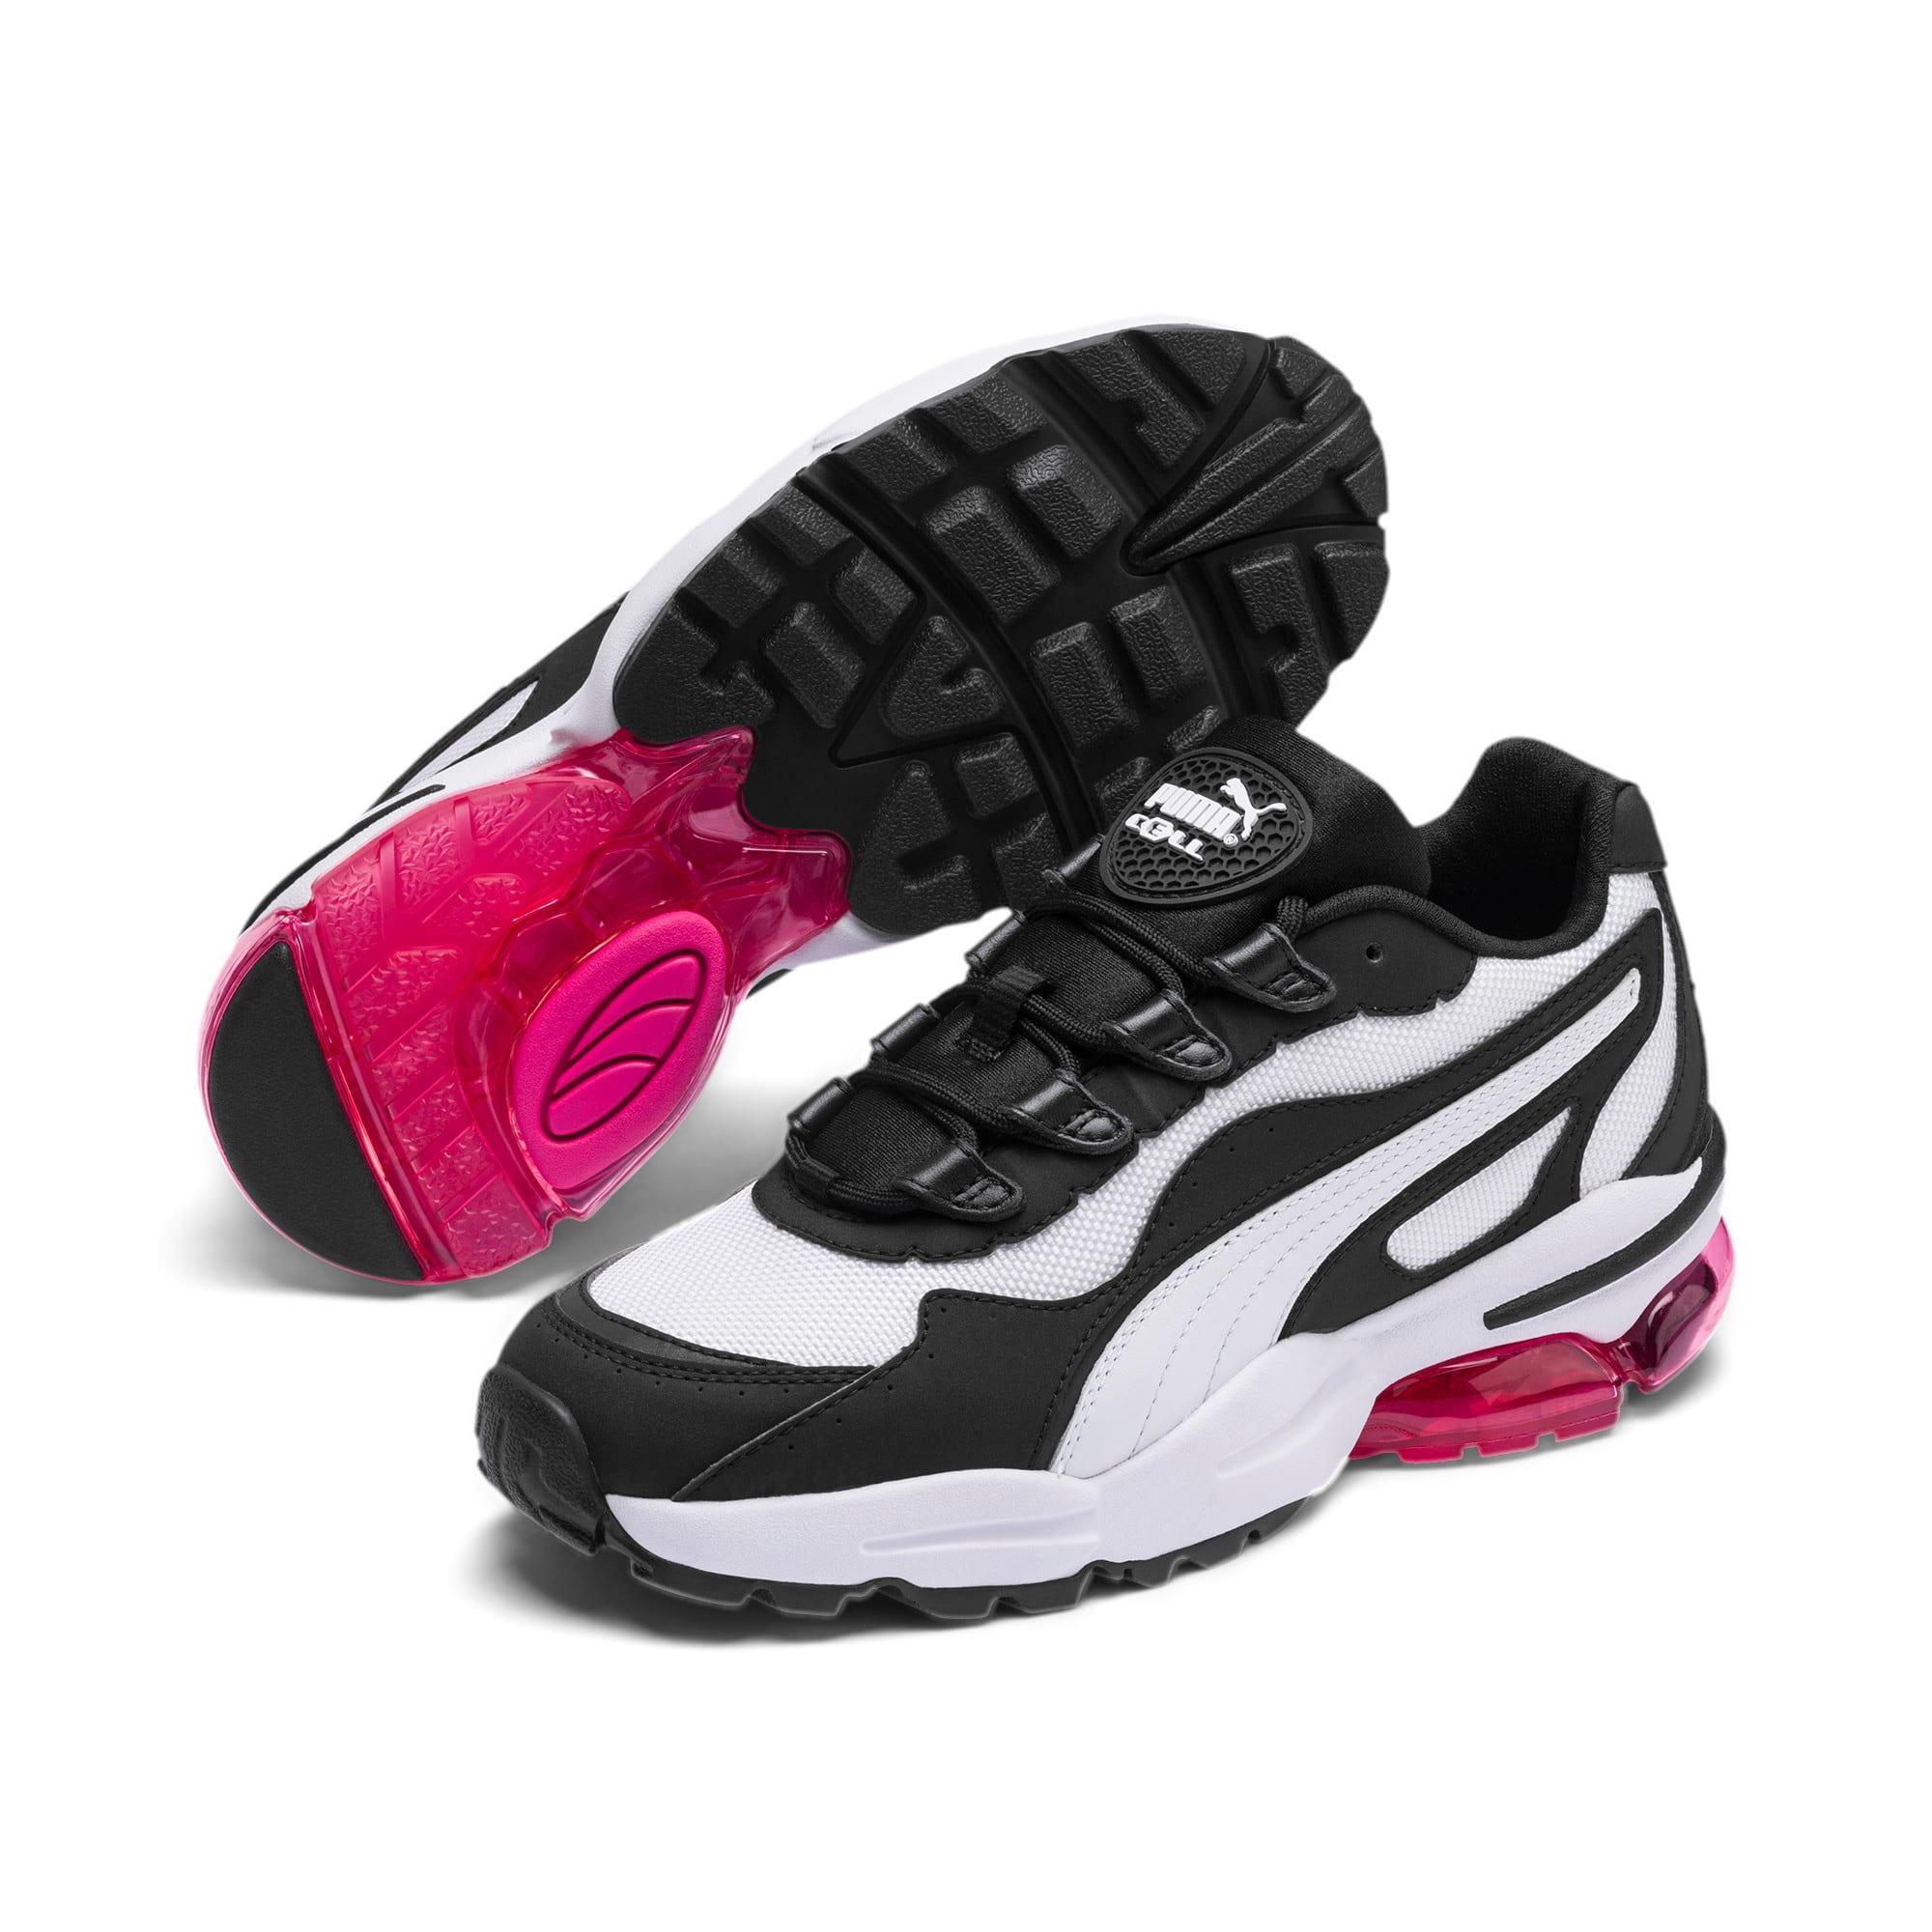 Miniatura 2 de Zapatos deportivos CELL Stellar para mujer, Puma White-Puma Black, mediano